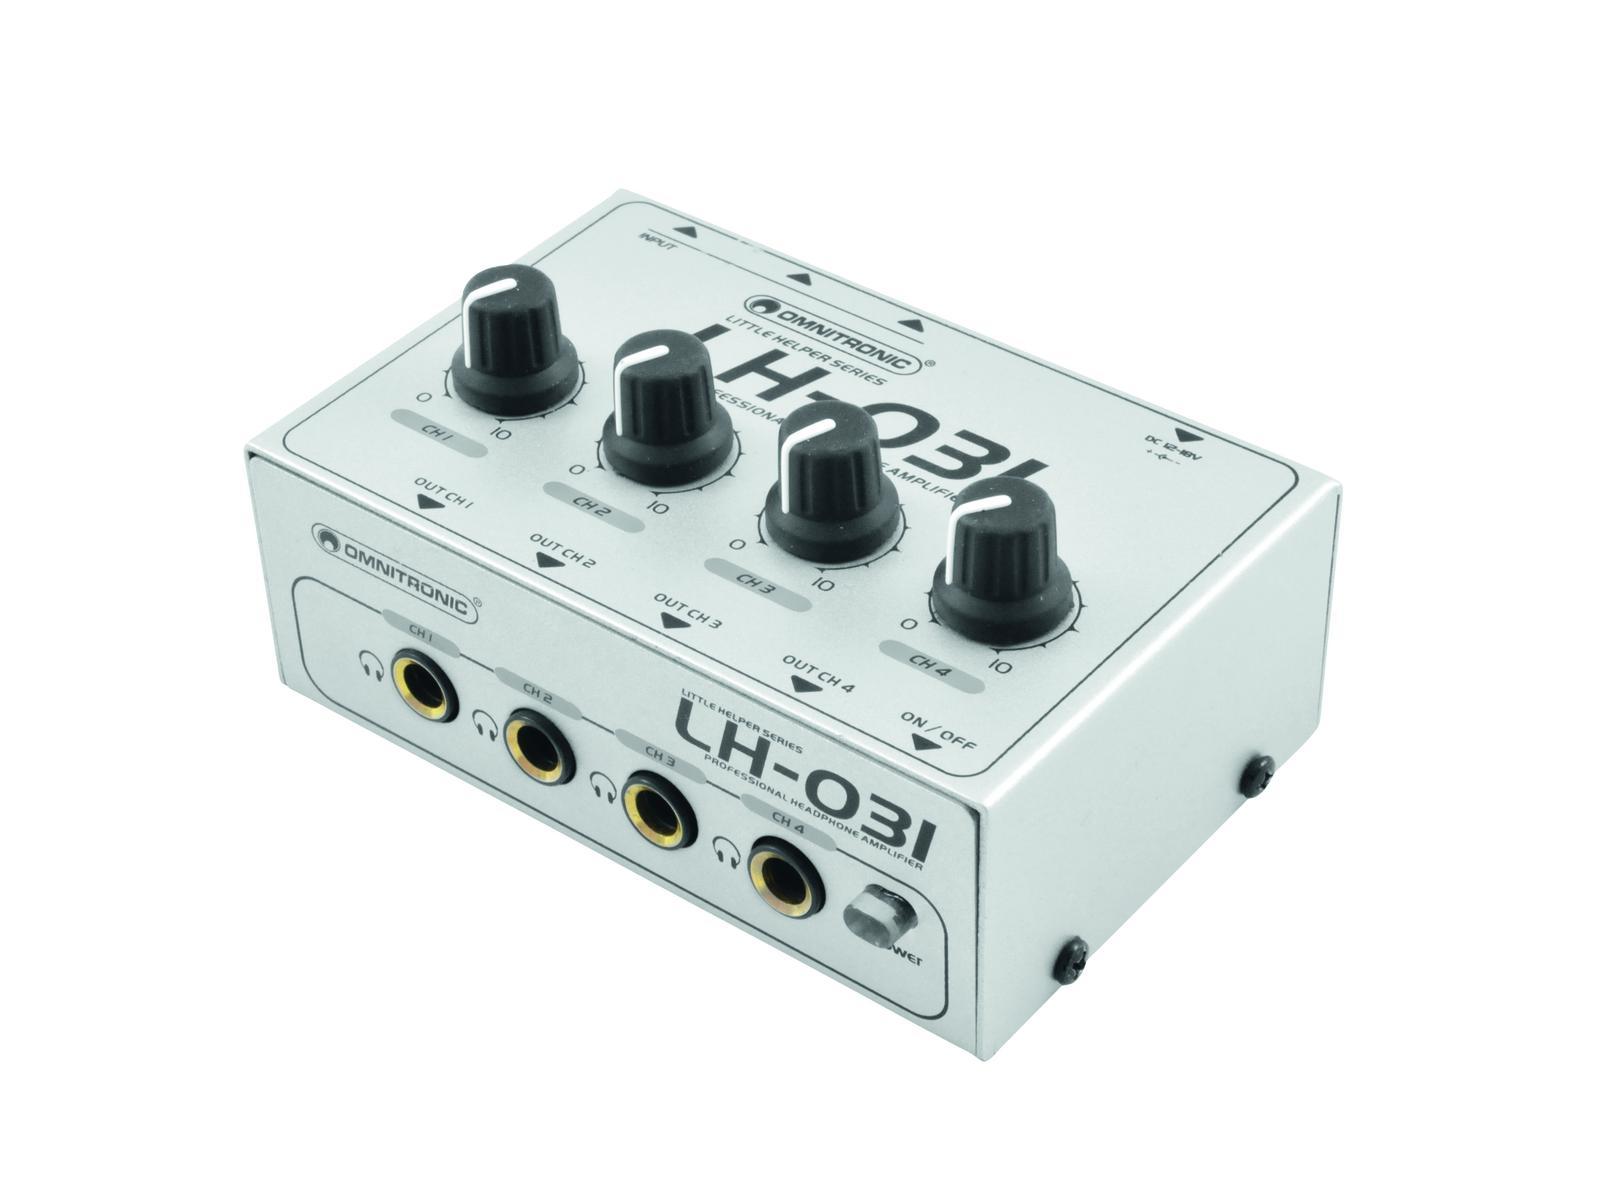 LH-031 Headphone amplifier